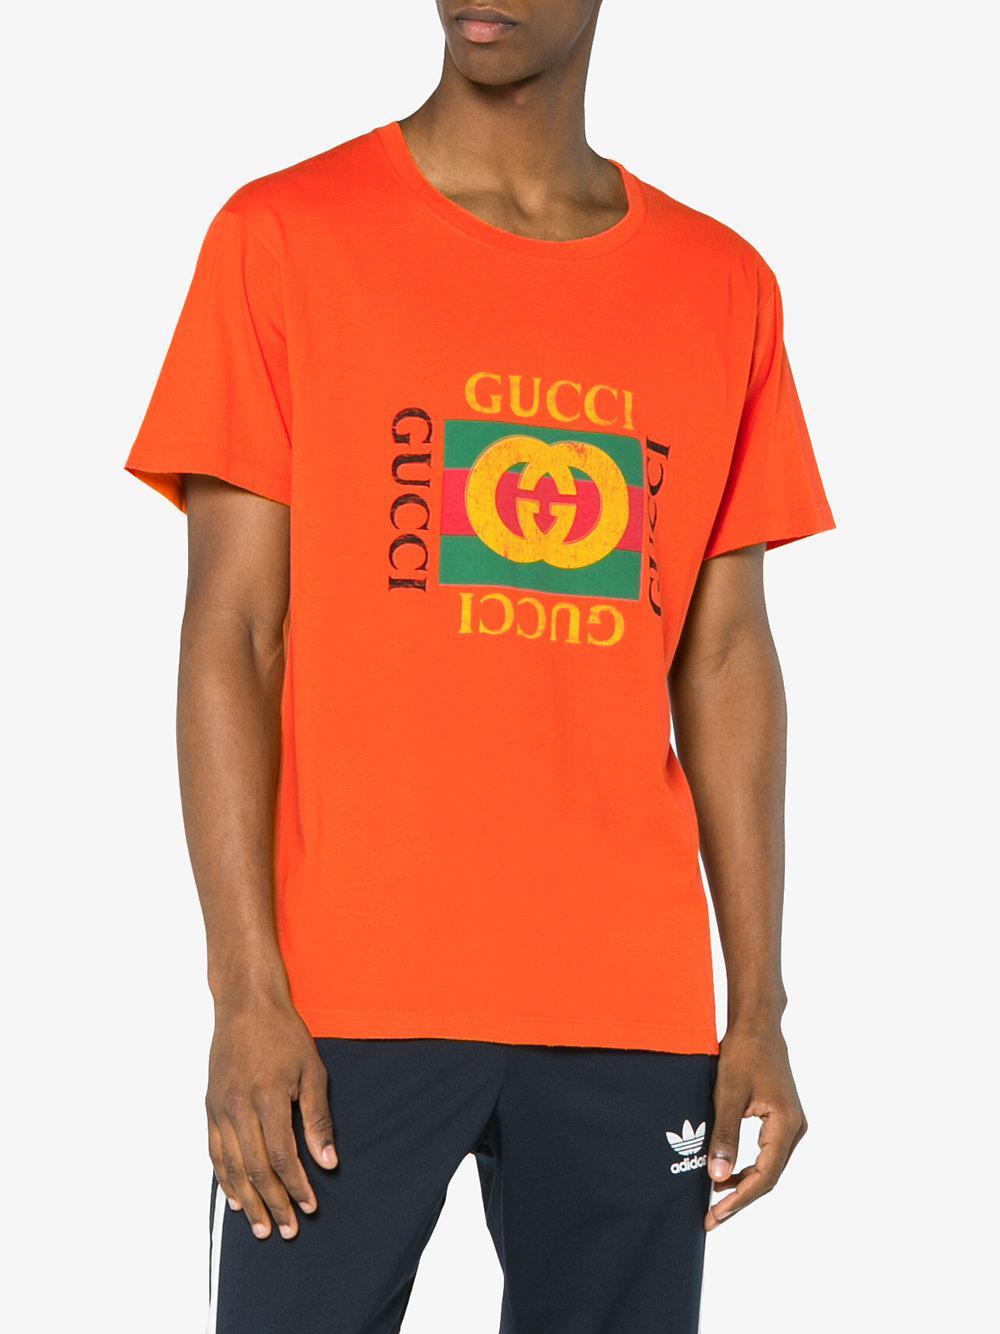 1aab406d0 Gucci Logo Print T Shirt in Orange for Men - Lyst